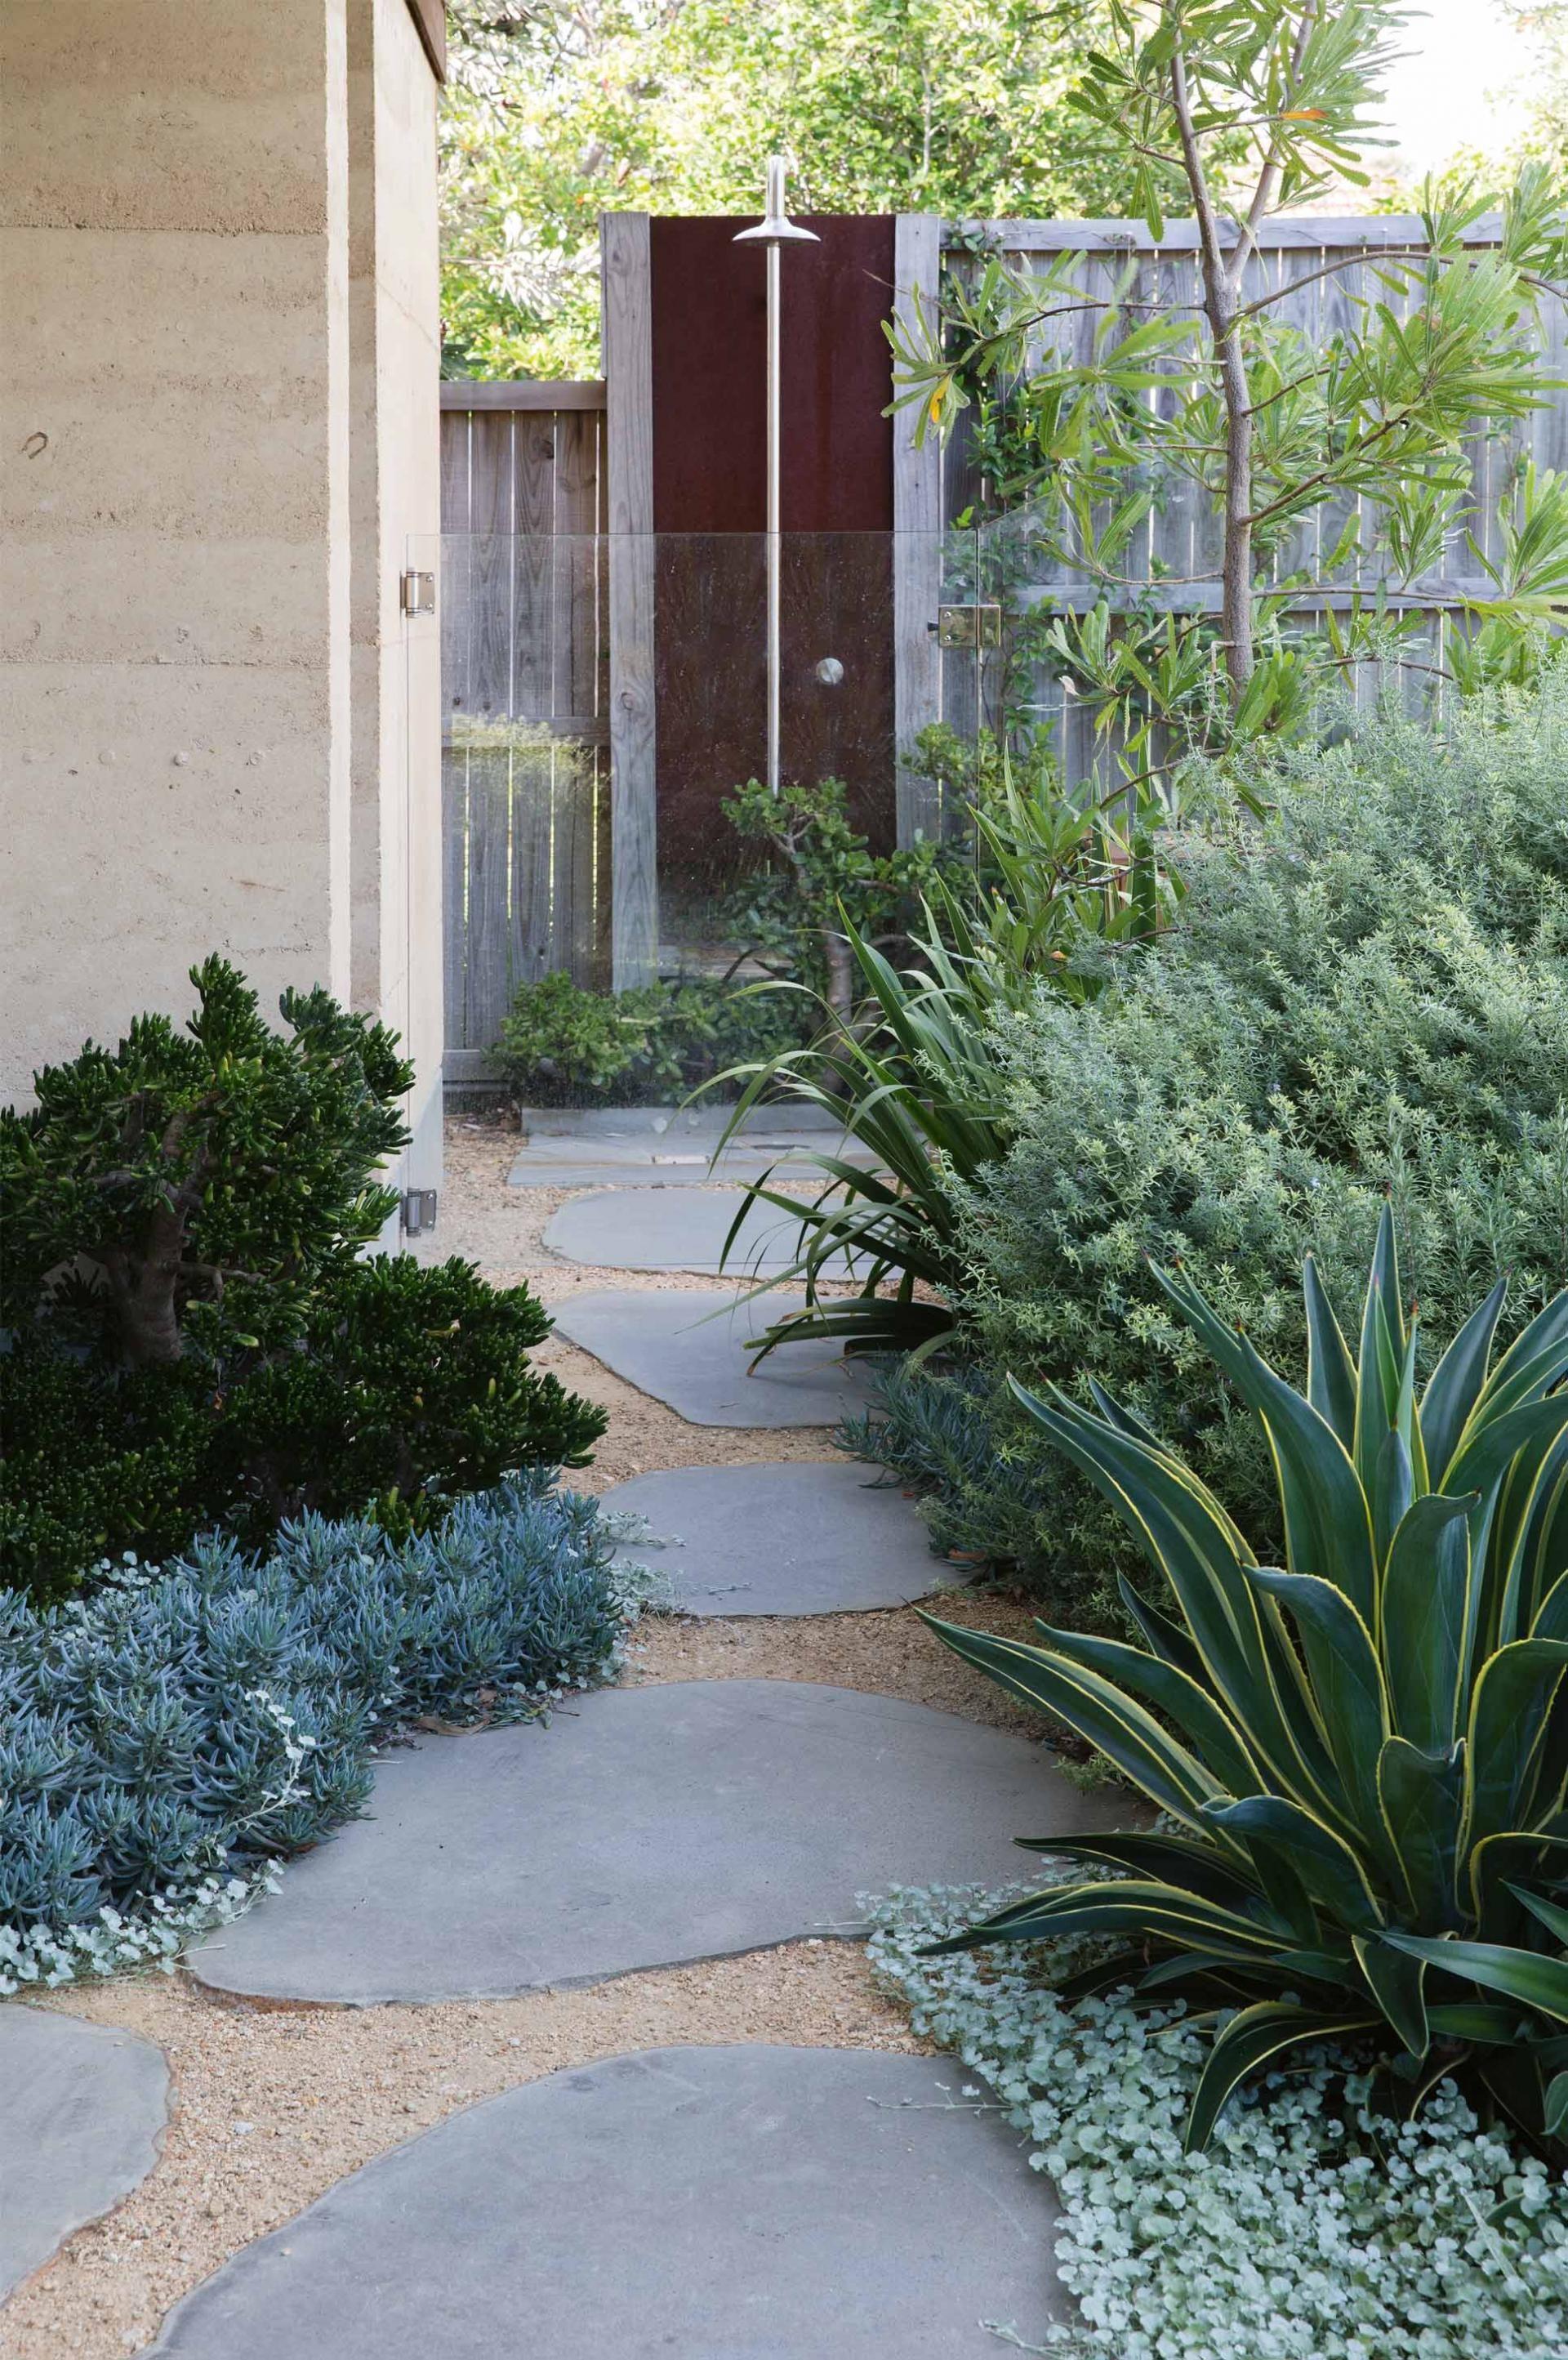 Blue Stone Pavers And A Discreet Garden Shower With Images Outdoor Gardens Urban Garden Garden Design